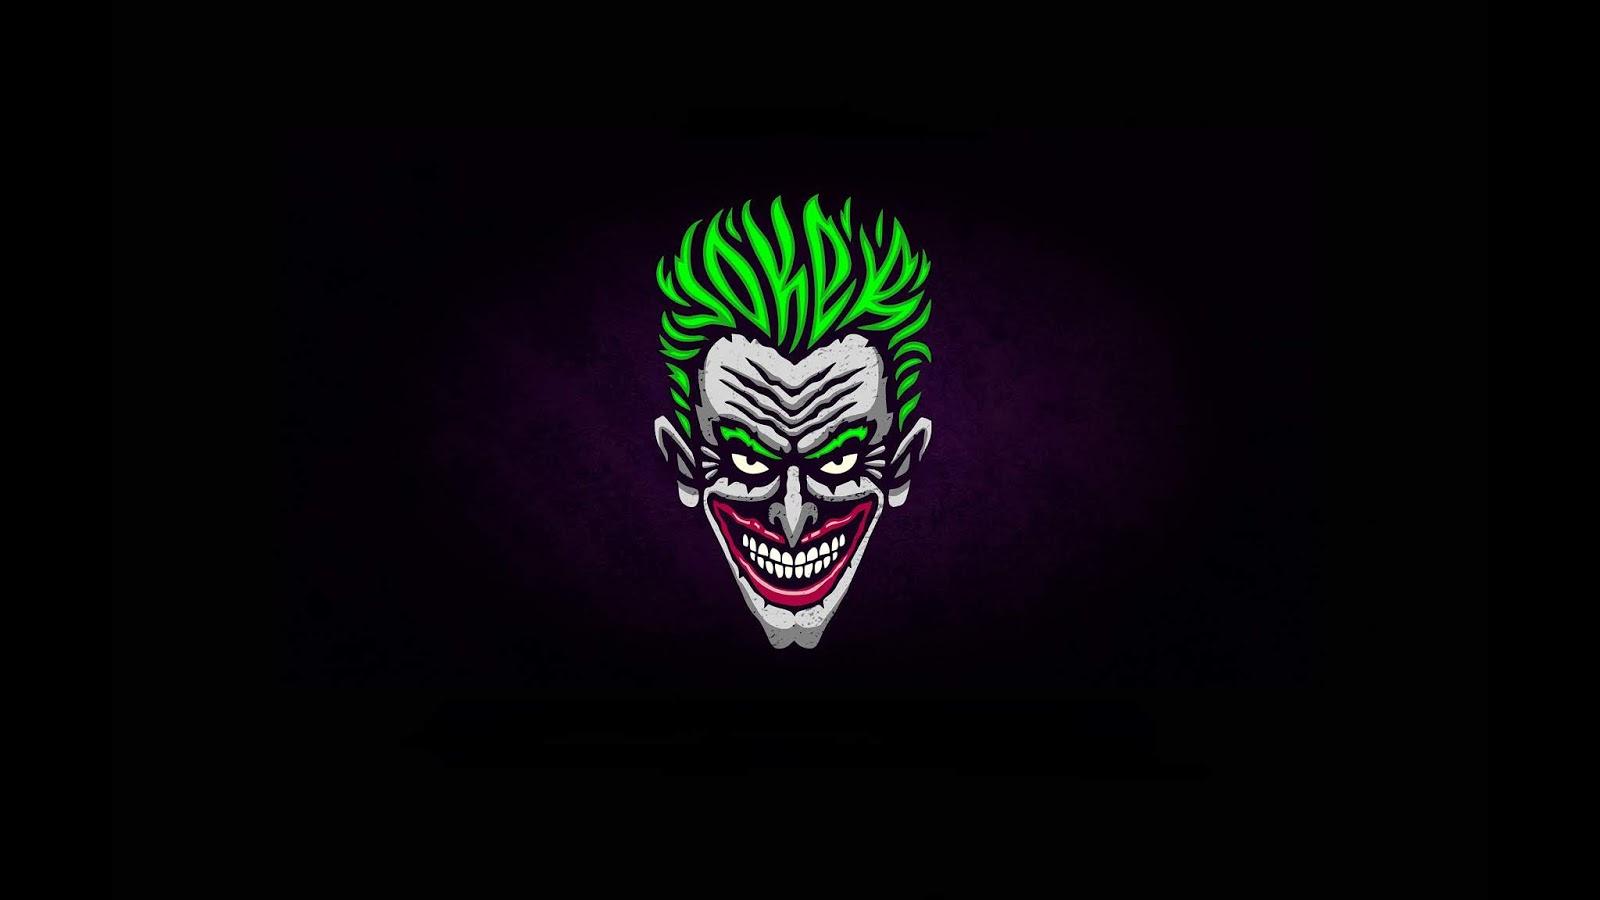 joker-4k-ultra-wallpaper